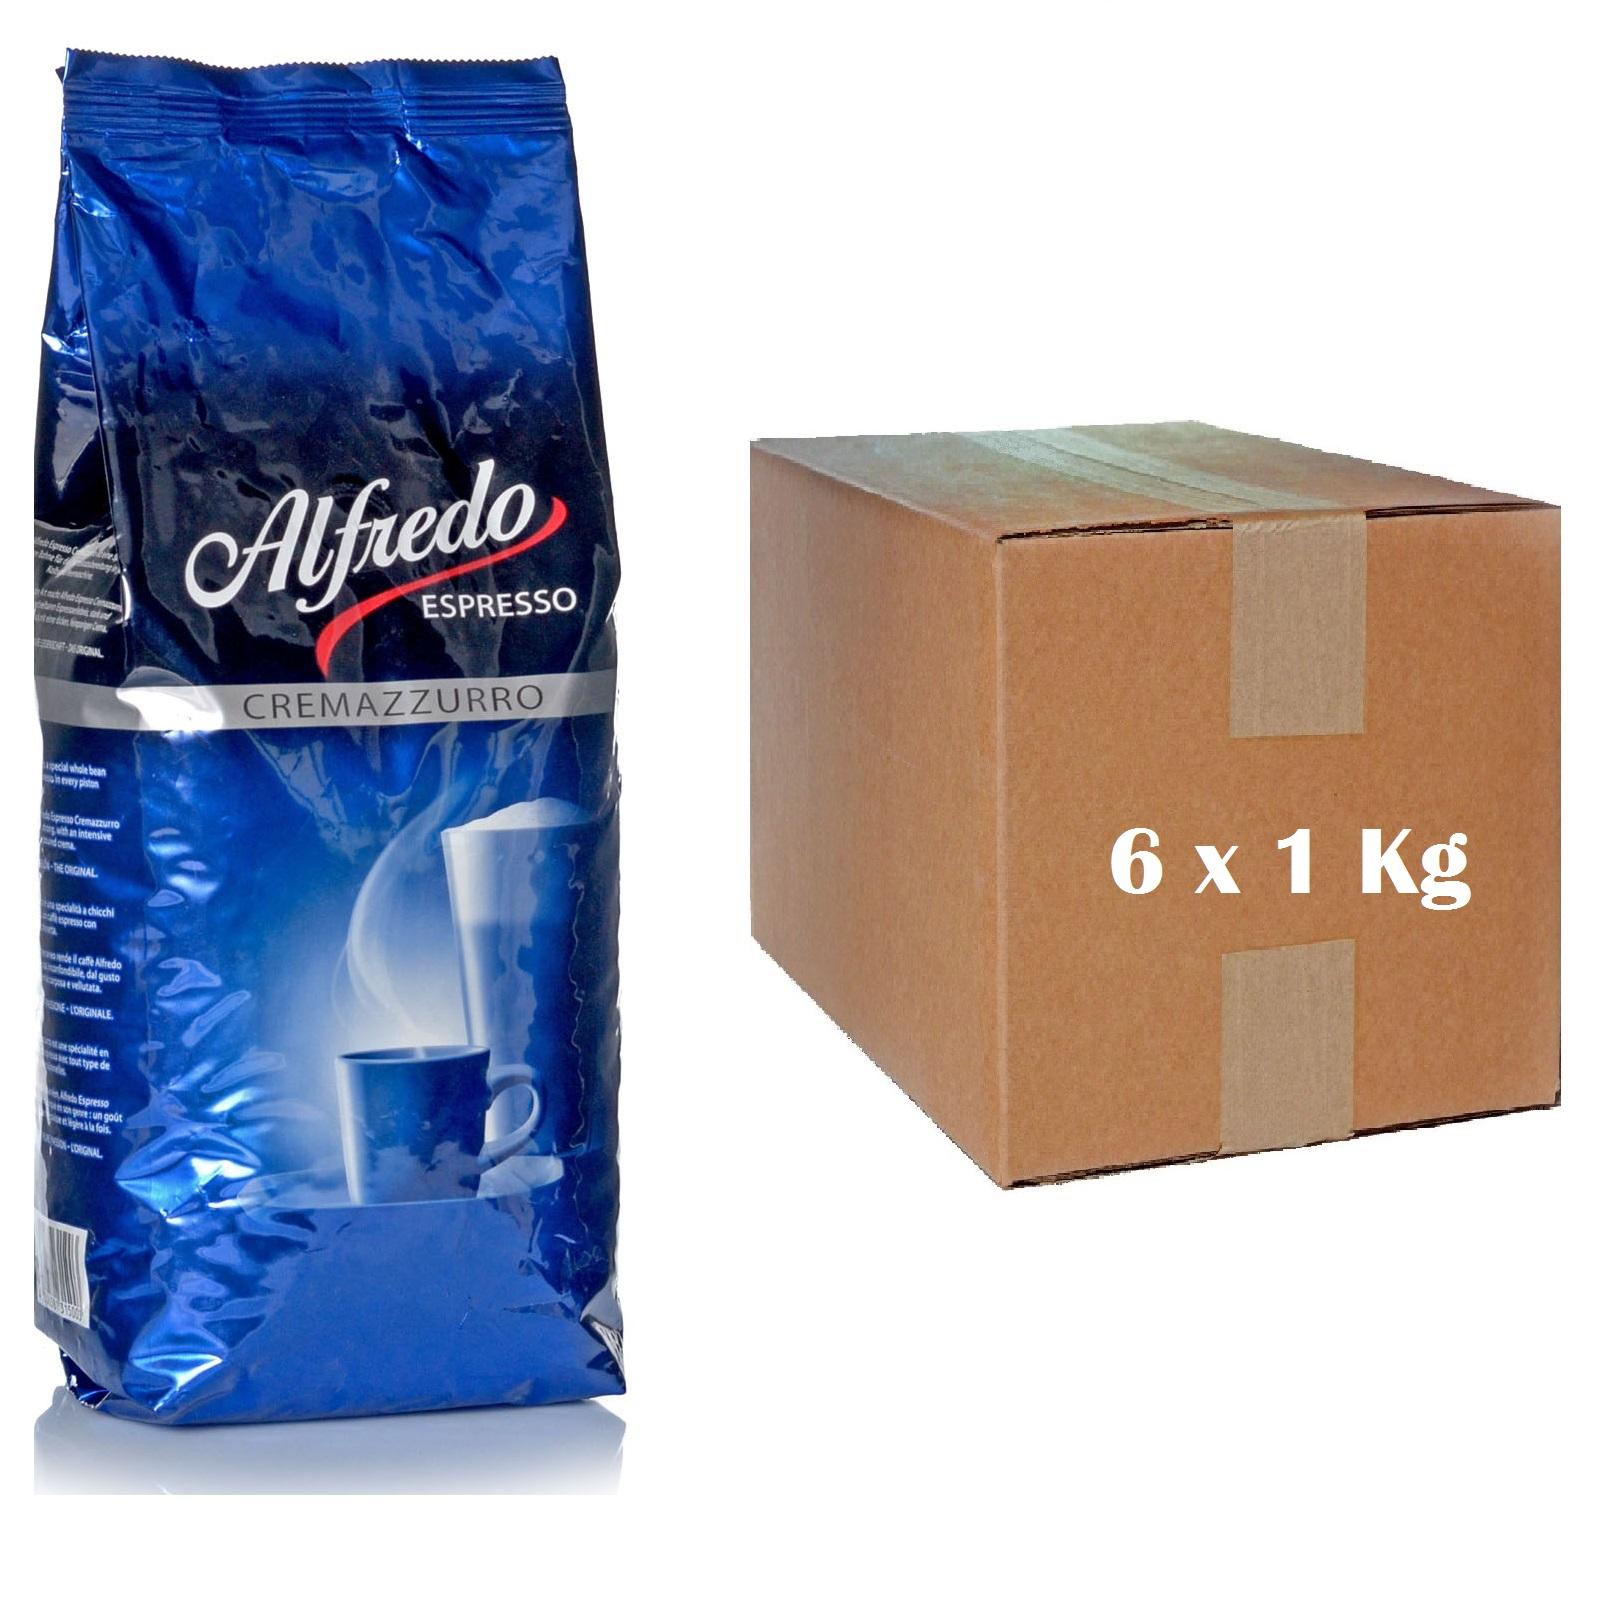 Alfredo Espresso Cremazzurro 6 x 1 kg ganze Kaffeebohnen